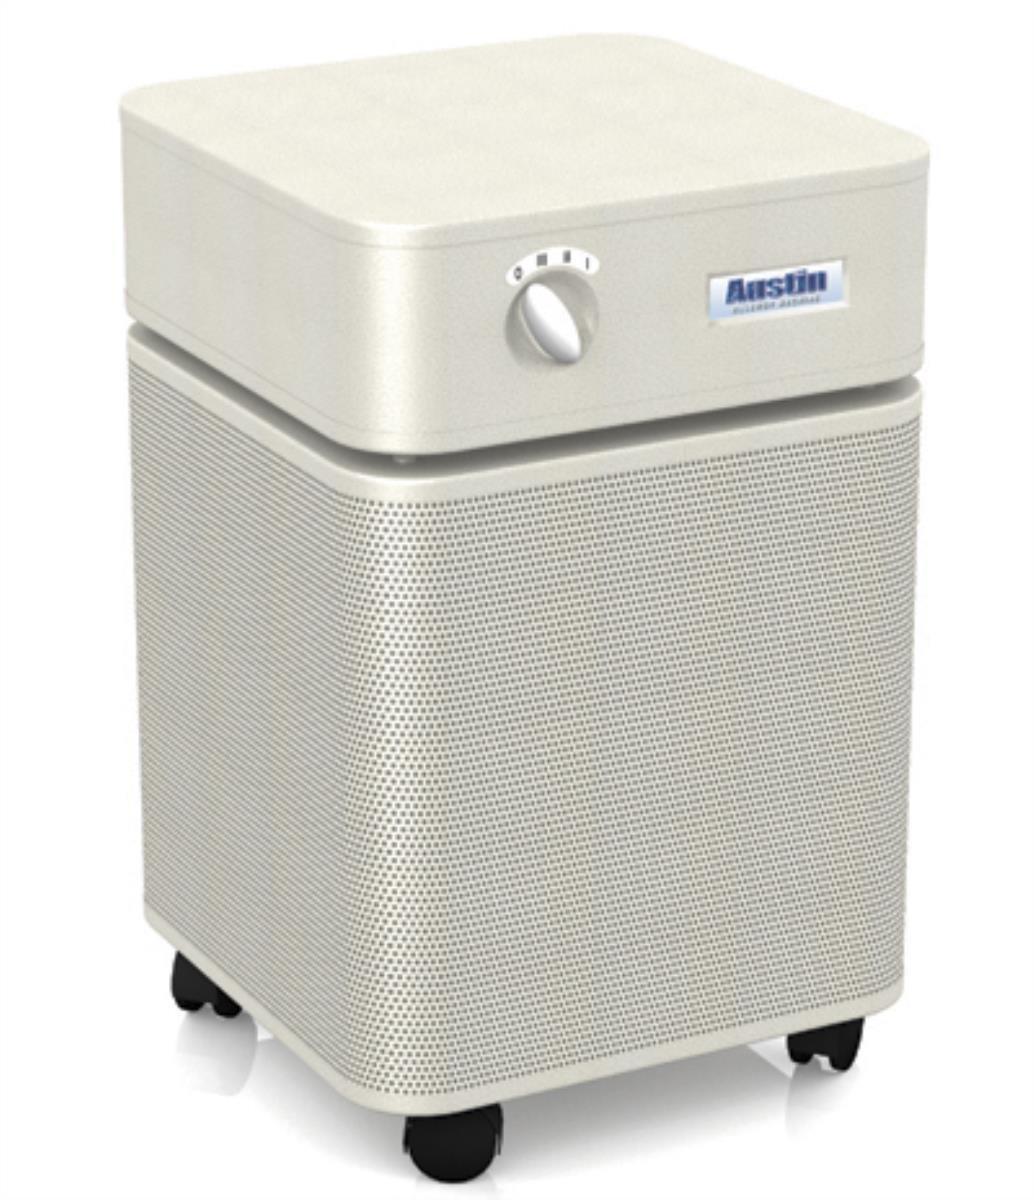 Best furnace air filters for allergies - Amazon Com Austin Air B405a1 Standard Allergy Hega Unit Allergy Machine Air Purifier Black Industrial Scientific